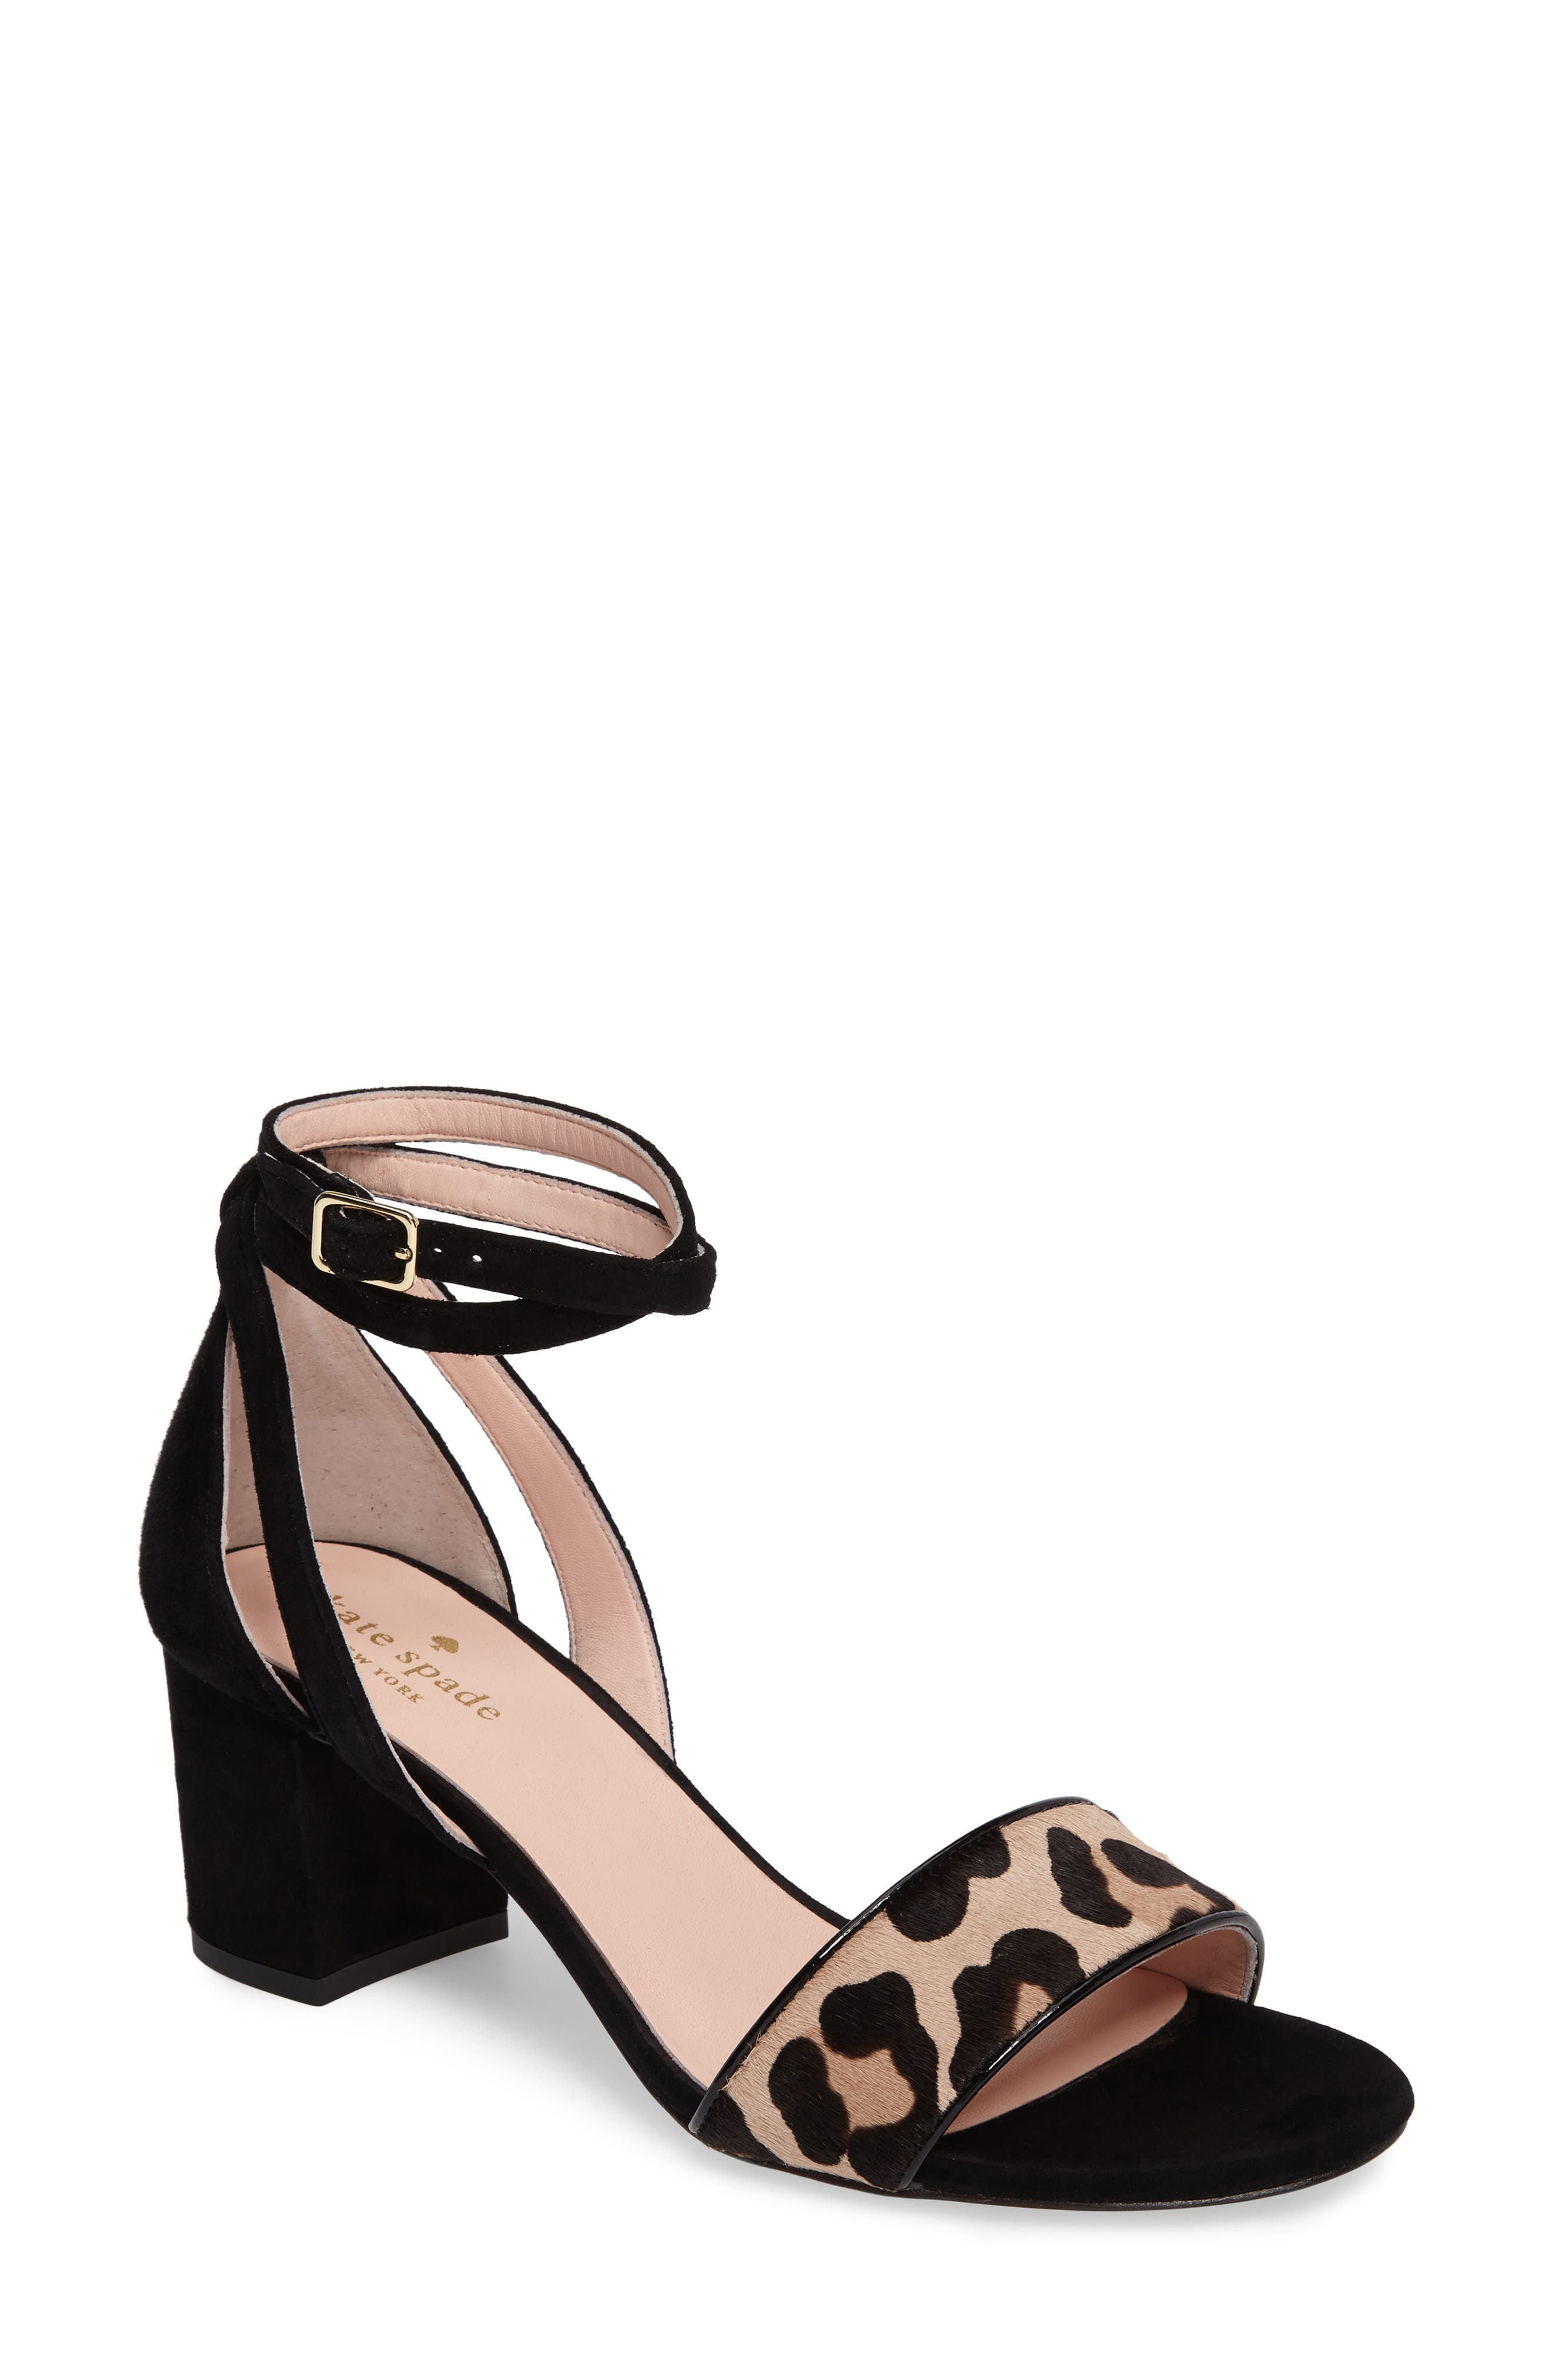 Main Image - kate spade new york watson genuine calf hair block heel sandal (Women)